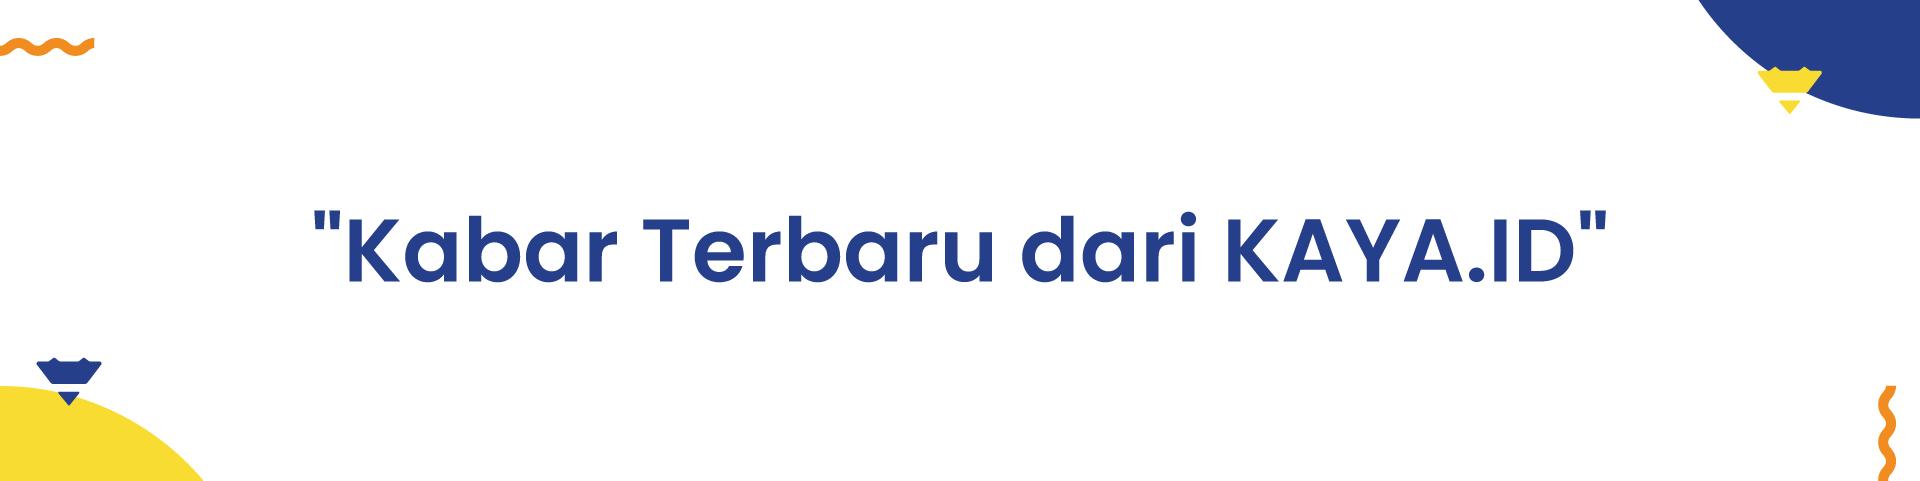 kabarterbaru-banner